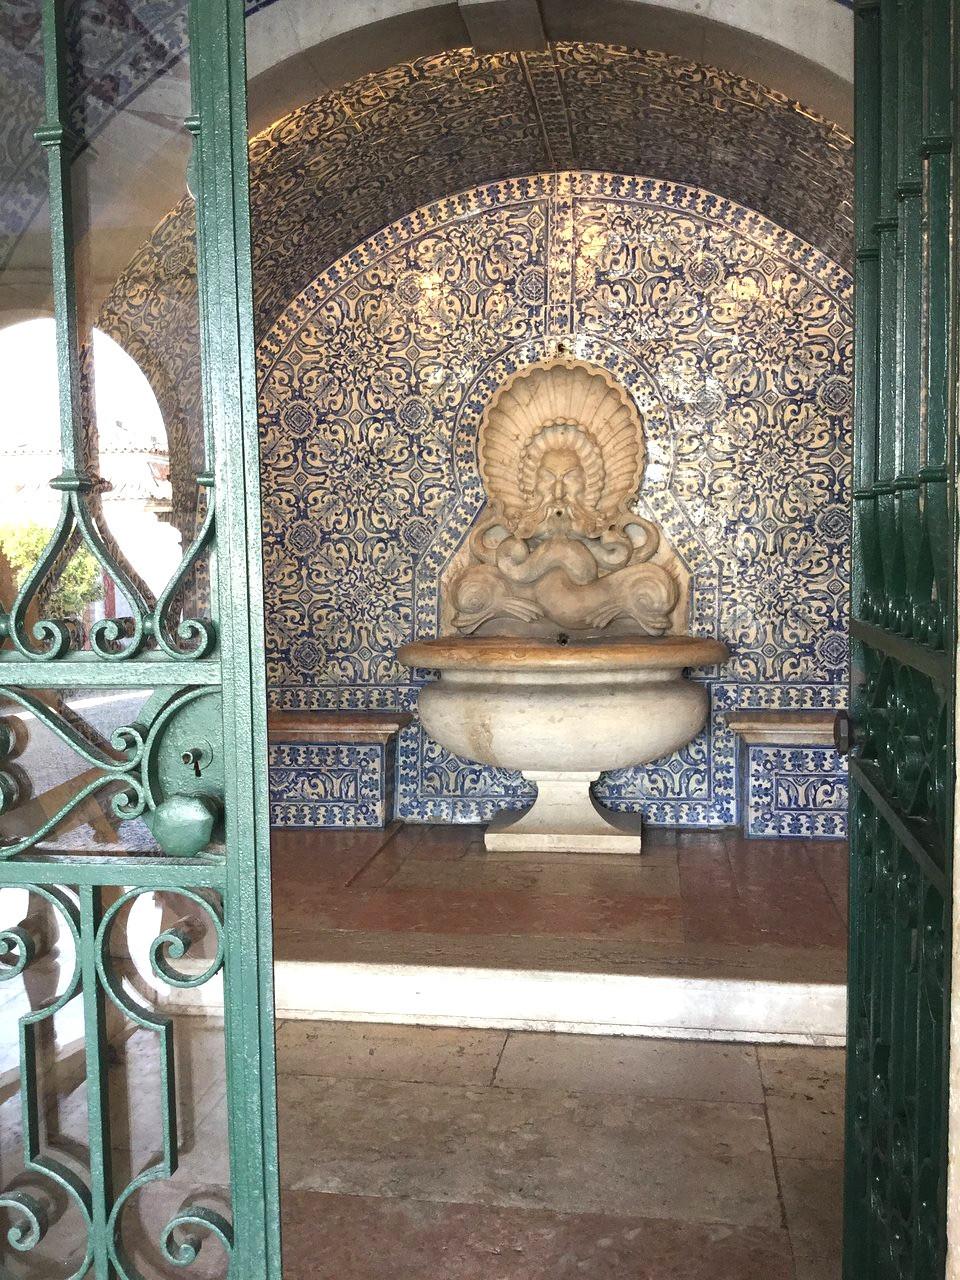 Moorish influence in the garden of Fronteira Palace